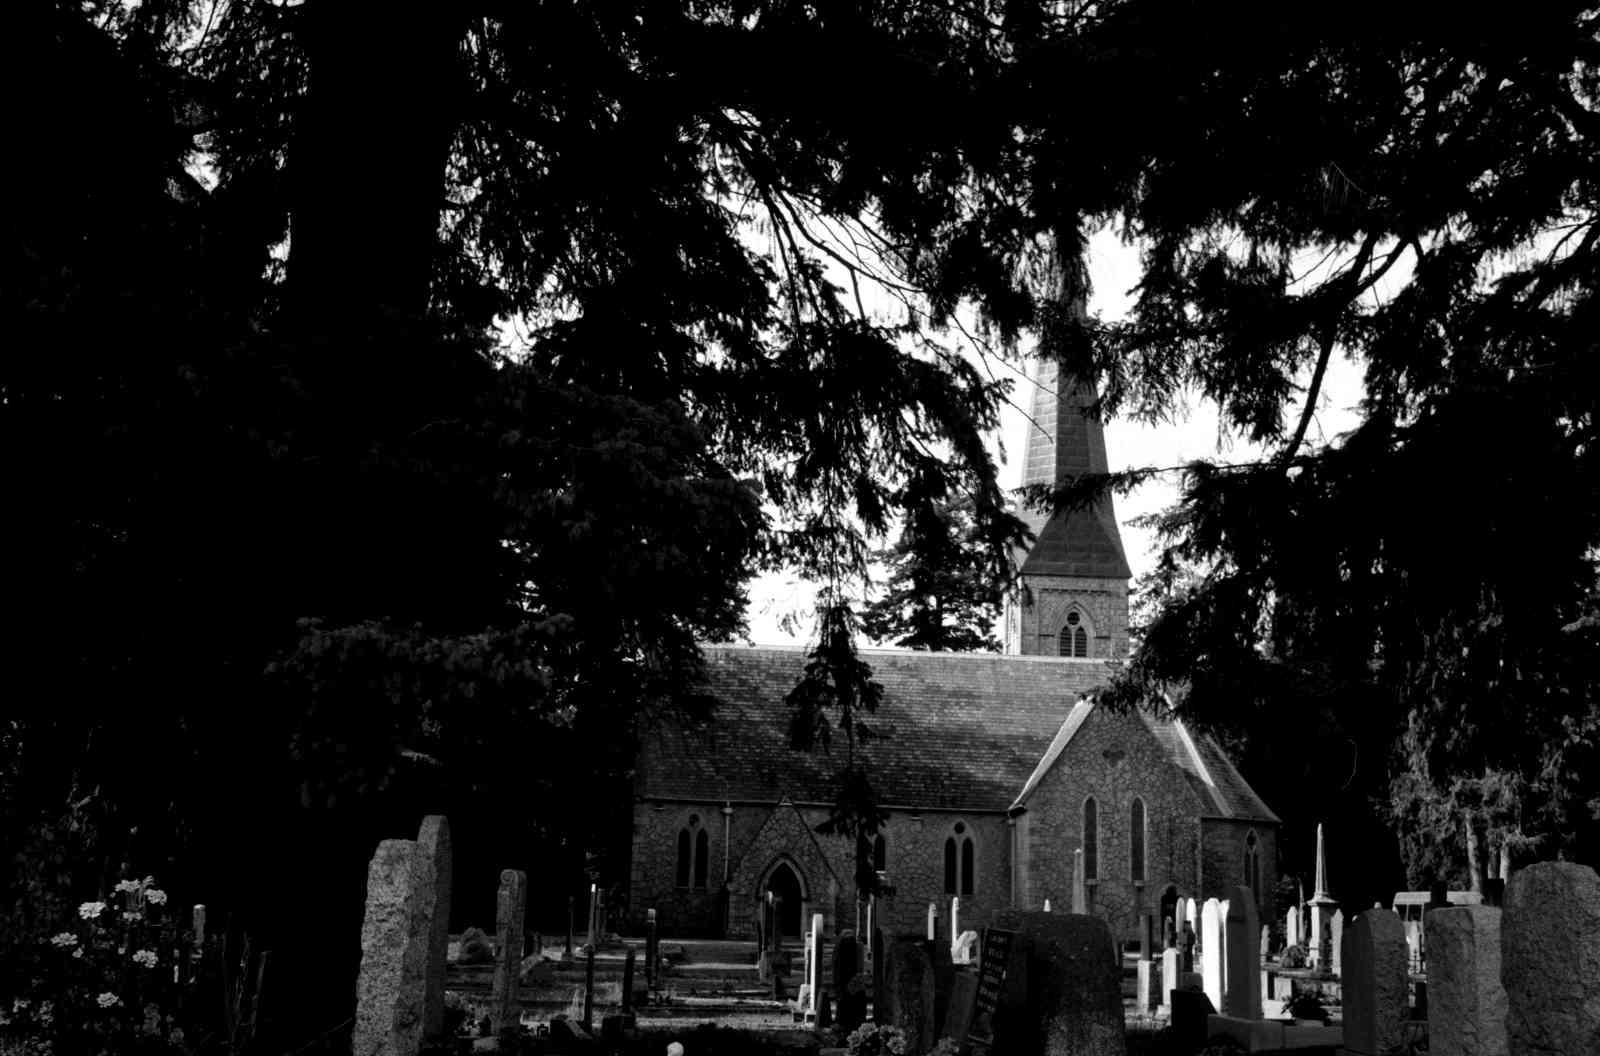 Friedhof Enniskerry 01, Rollei35 Ilford HP5 400